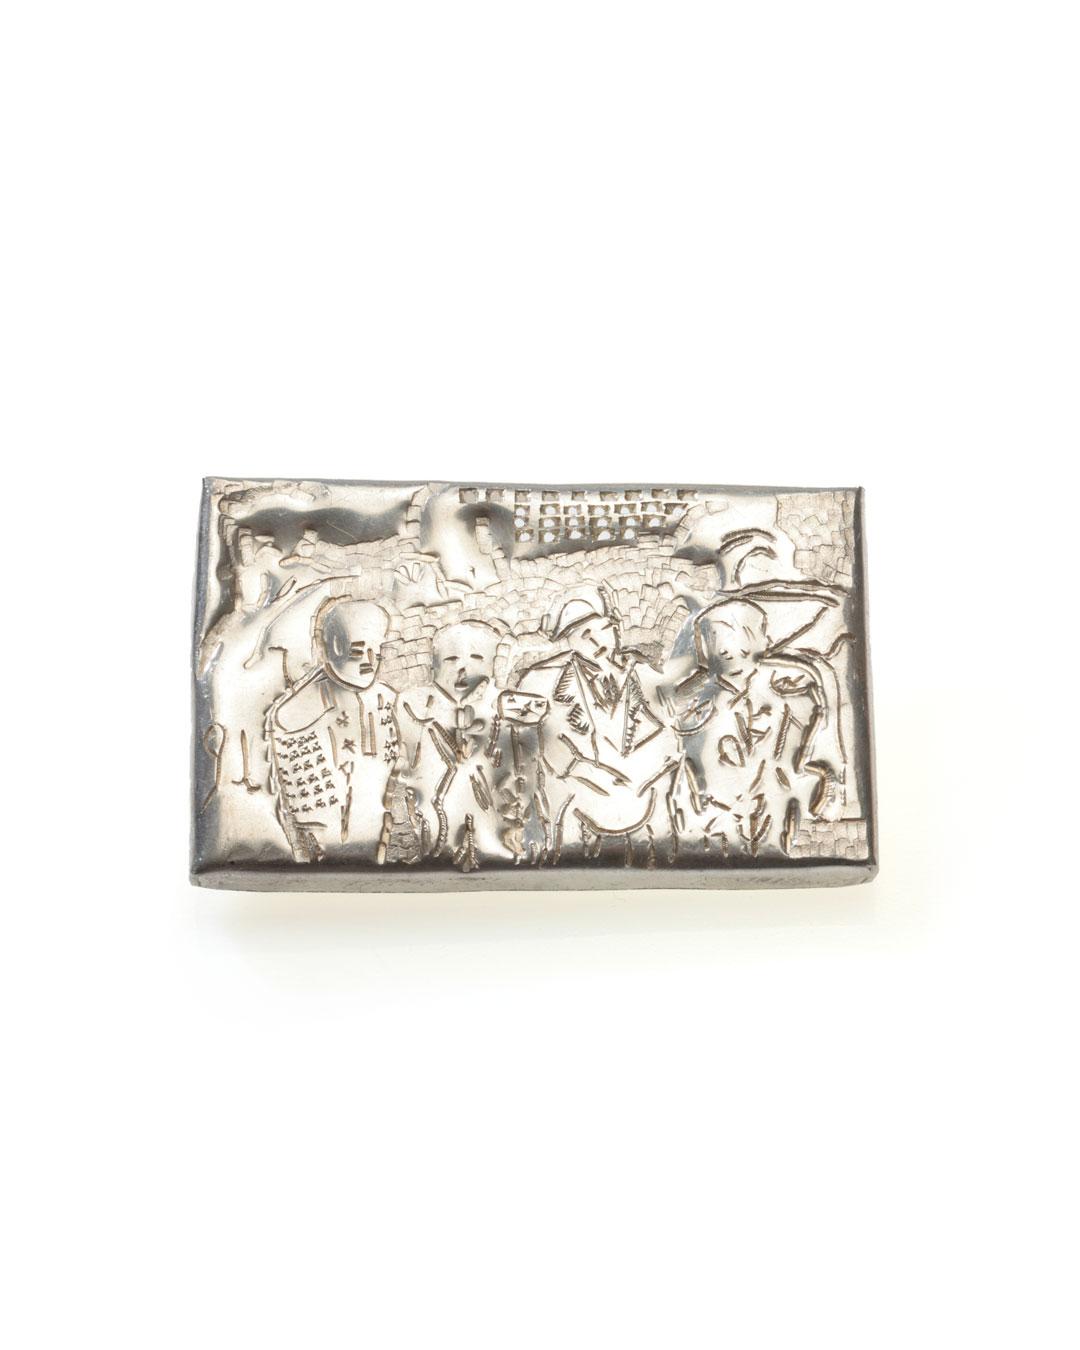 Rudolf Kocéa, Tenöre (Tenors), 2012, brooch; silver, 50 x 80 x 6 mm, €1050